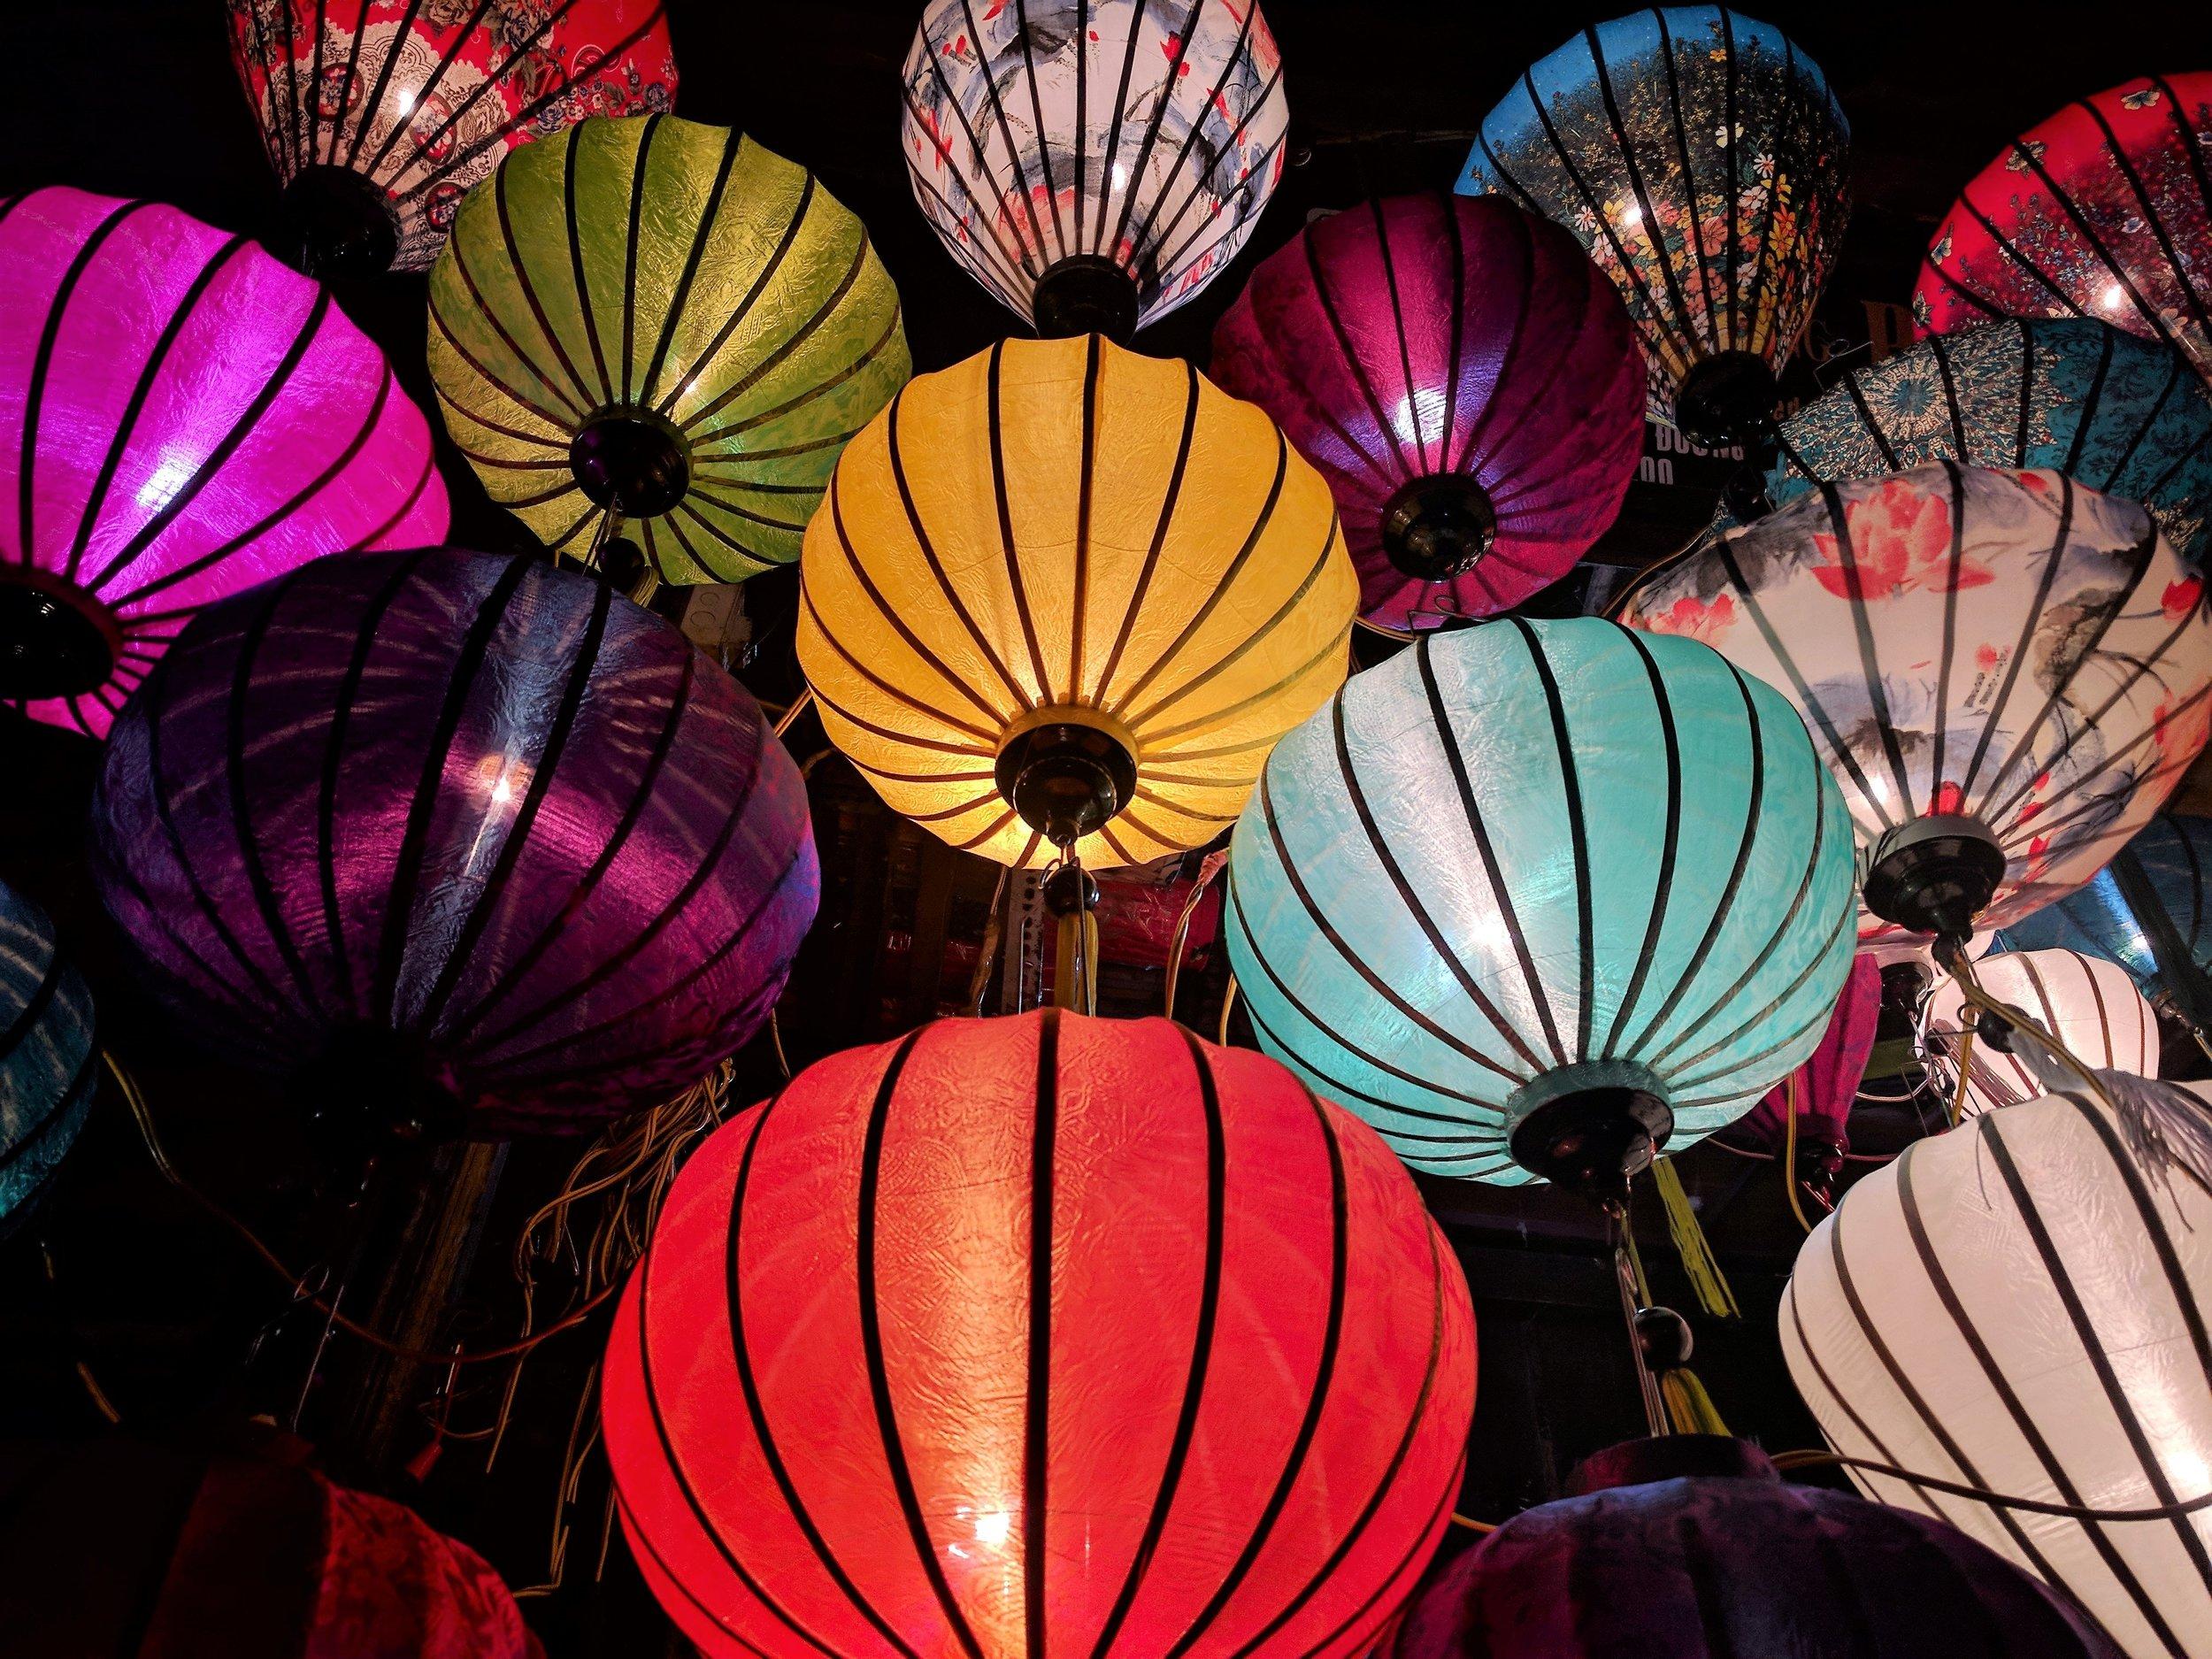 art-bright-chinese-lanterns-707265.jpg